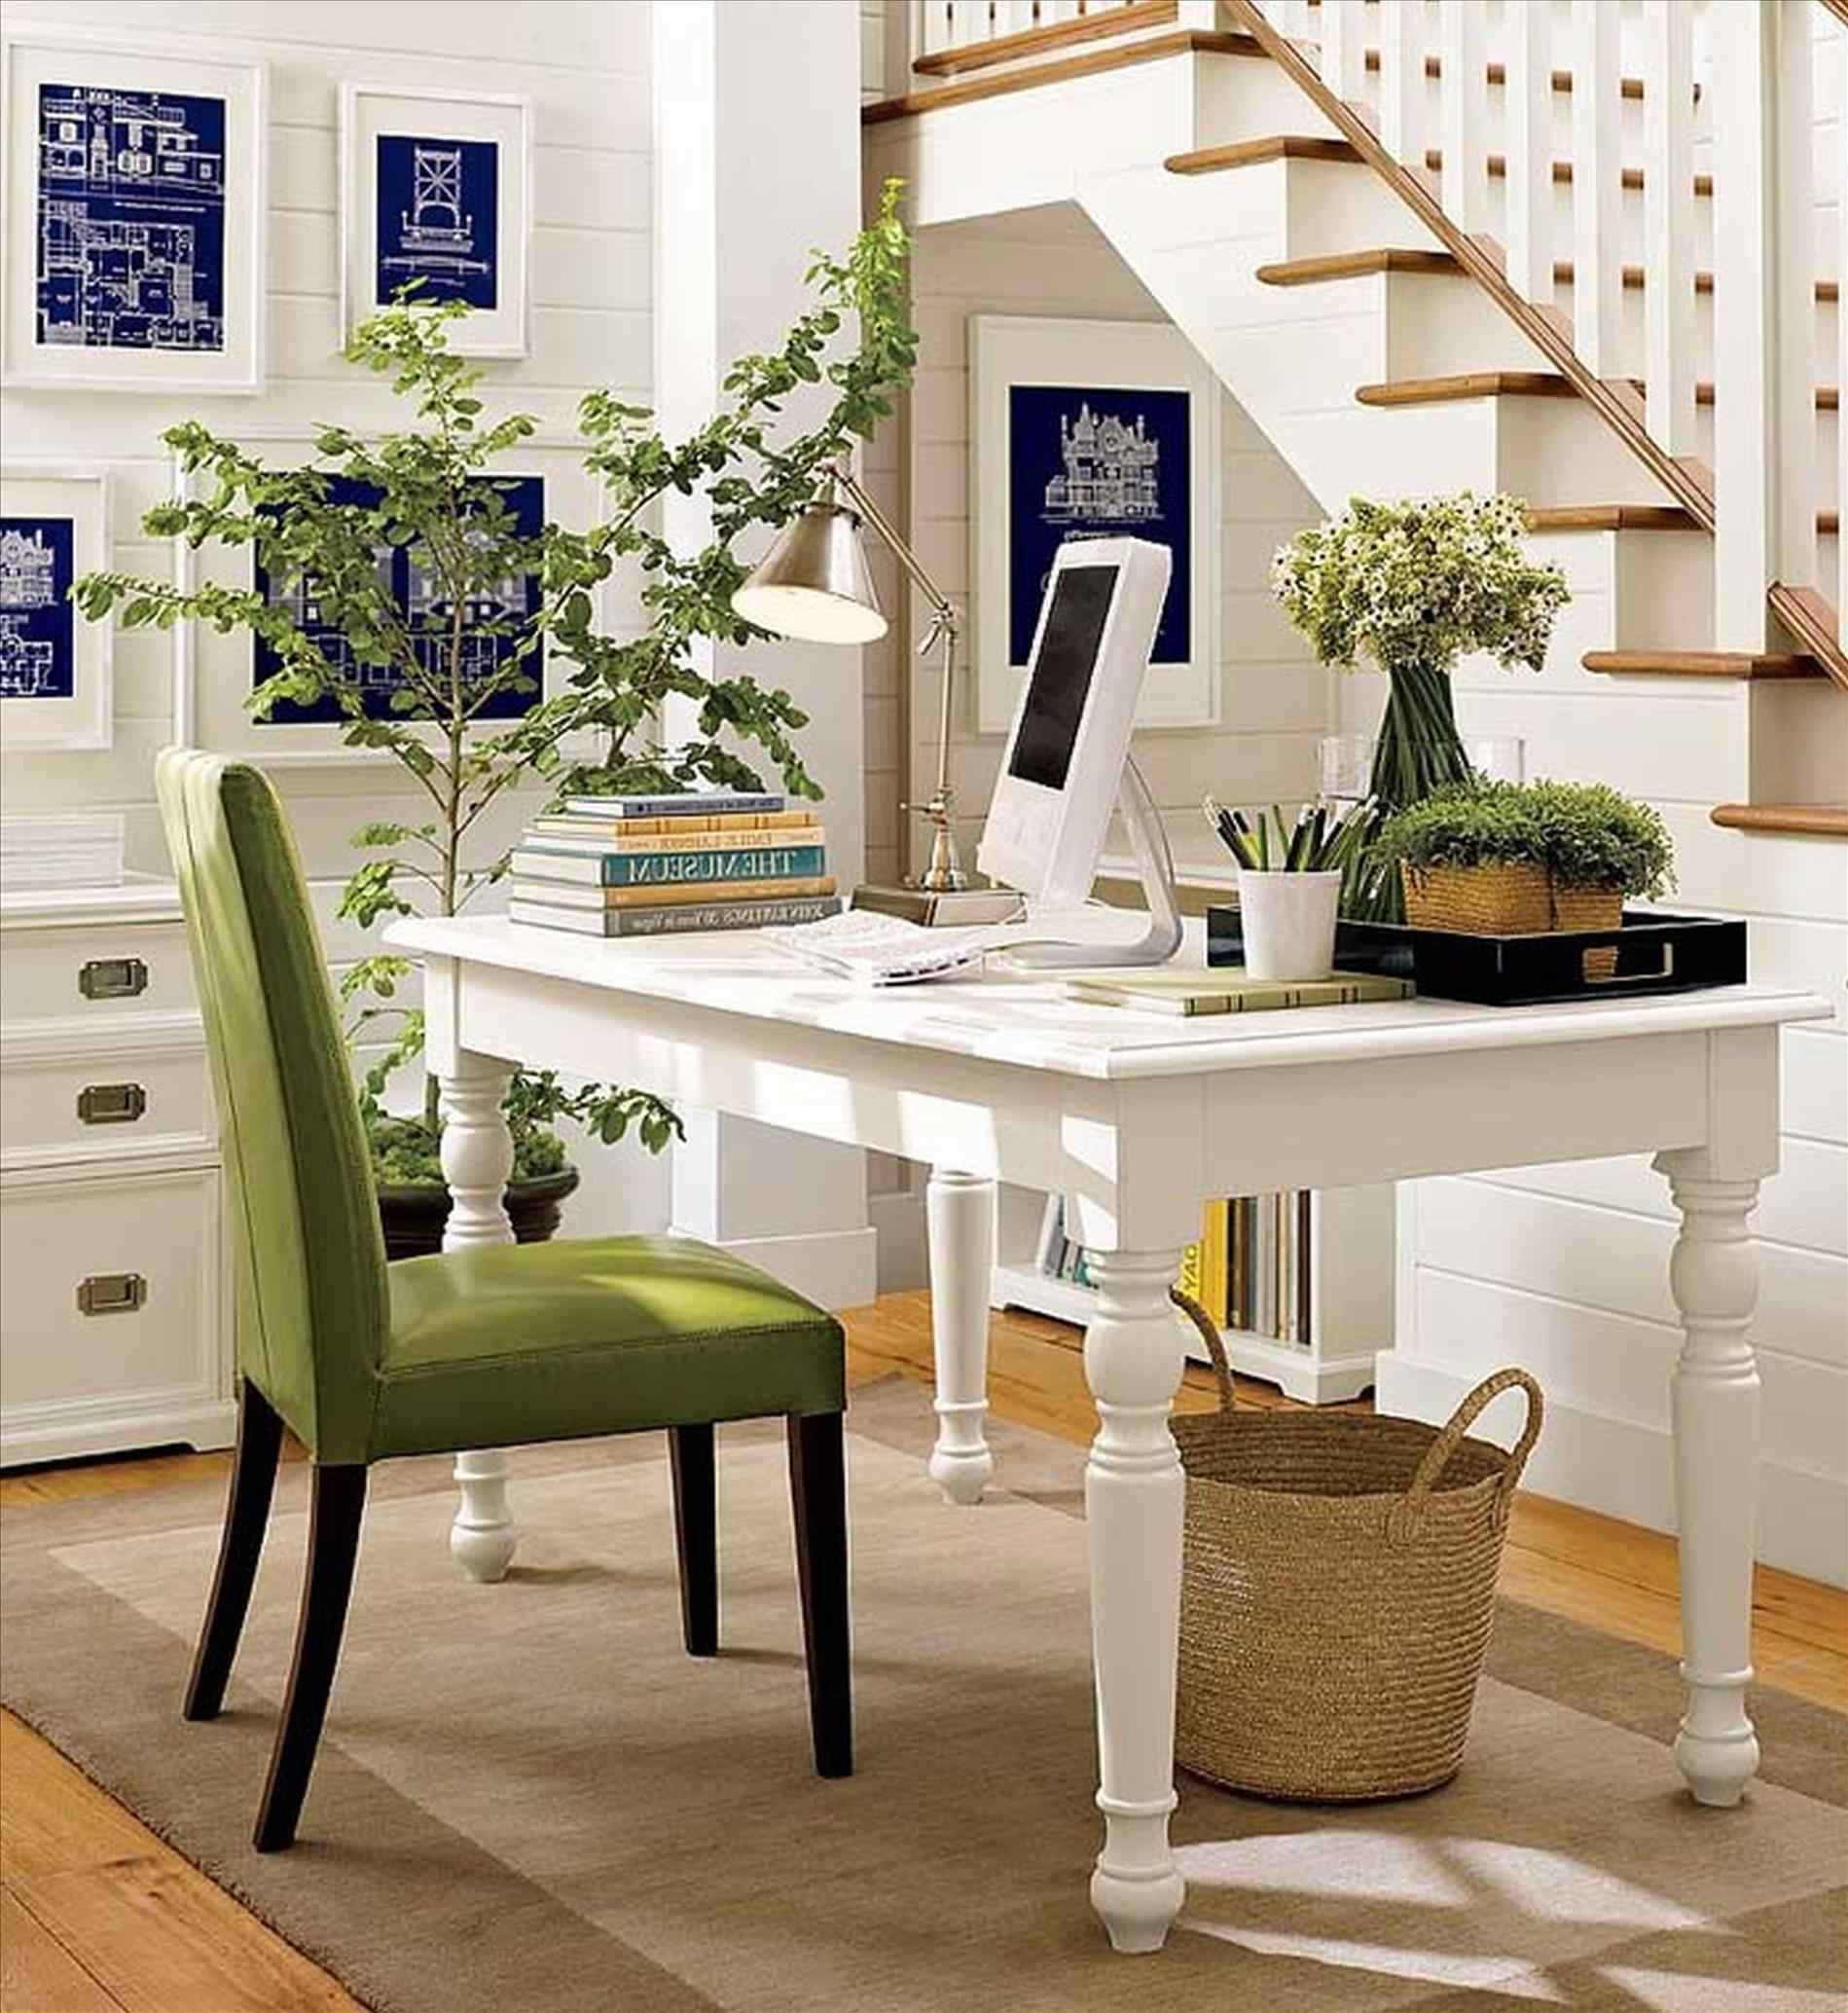 Gorgeous 10+ Zen Office Design Ideas For Cozy Room